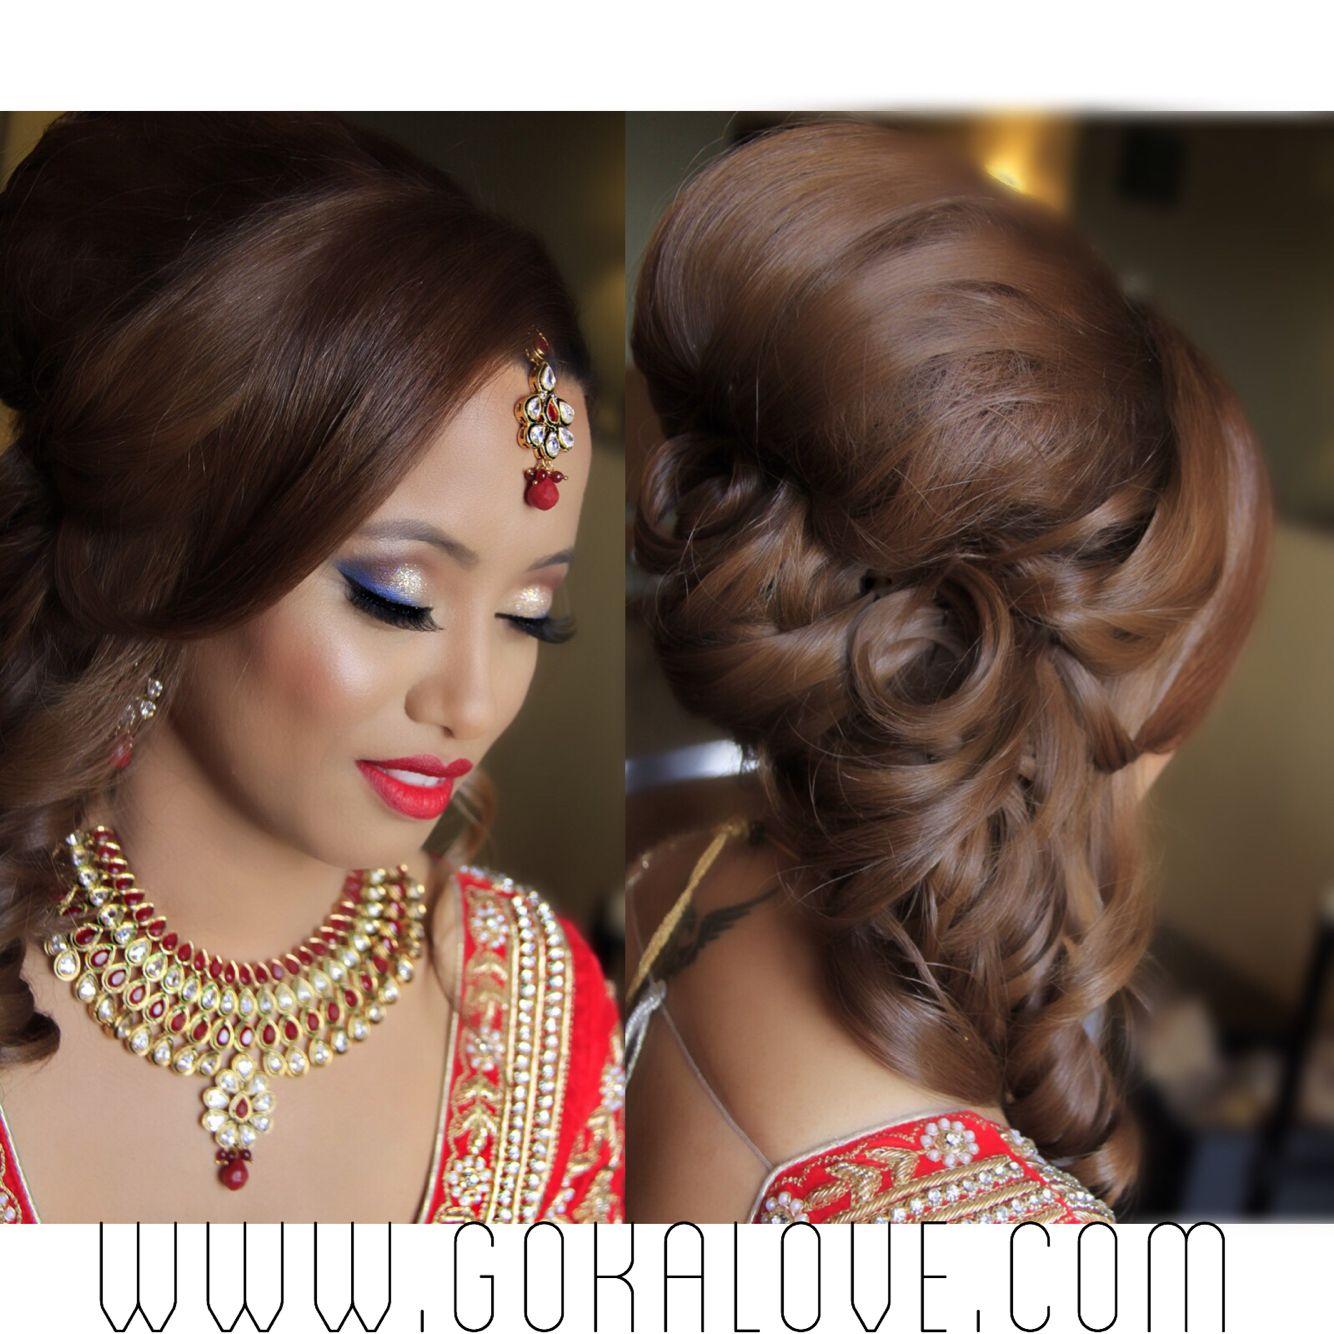 Worst makeup mistakes on your wedding indian bridal diaries - Makeup And Hair Boston Indian Wedding Nepali Wedding Massachusetts Makeup Artist